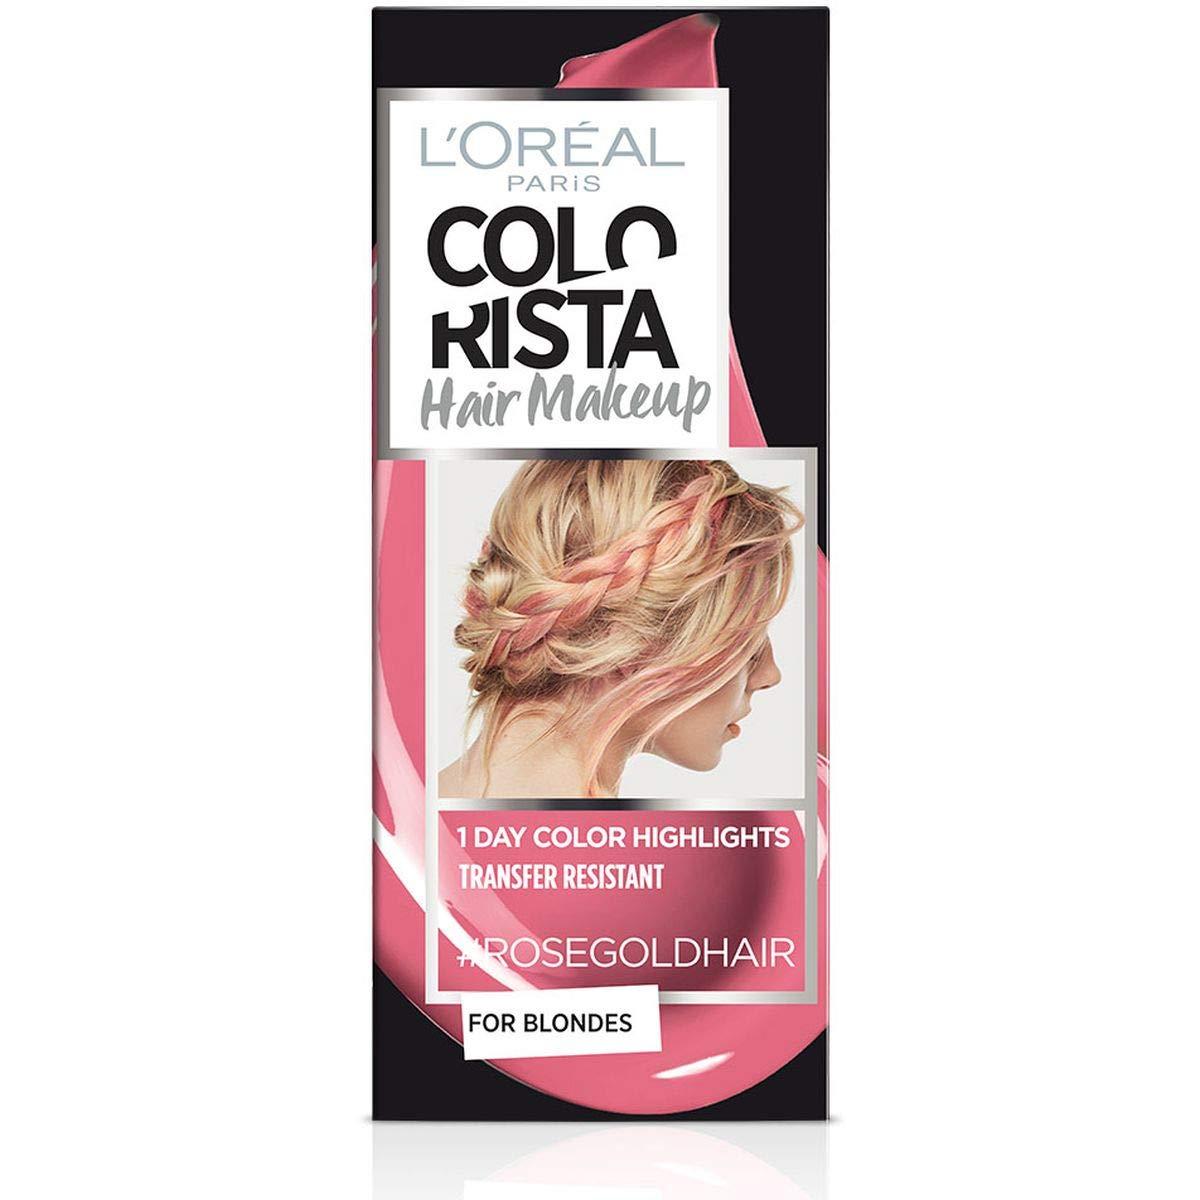 L'Oreal Paris Colorista Hair Make Up Rose Gold